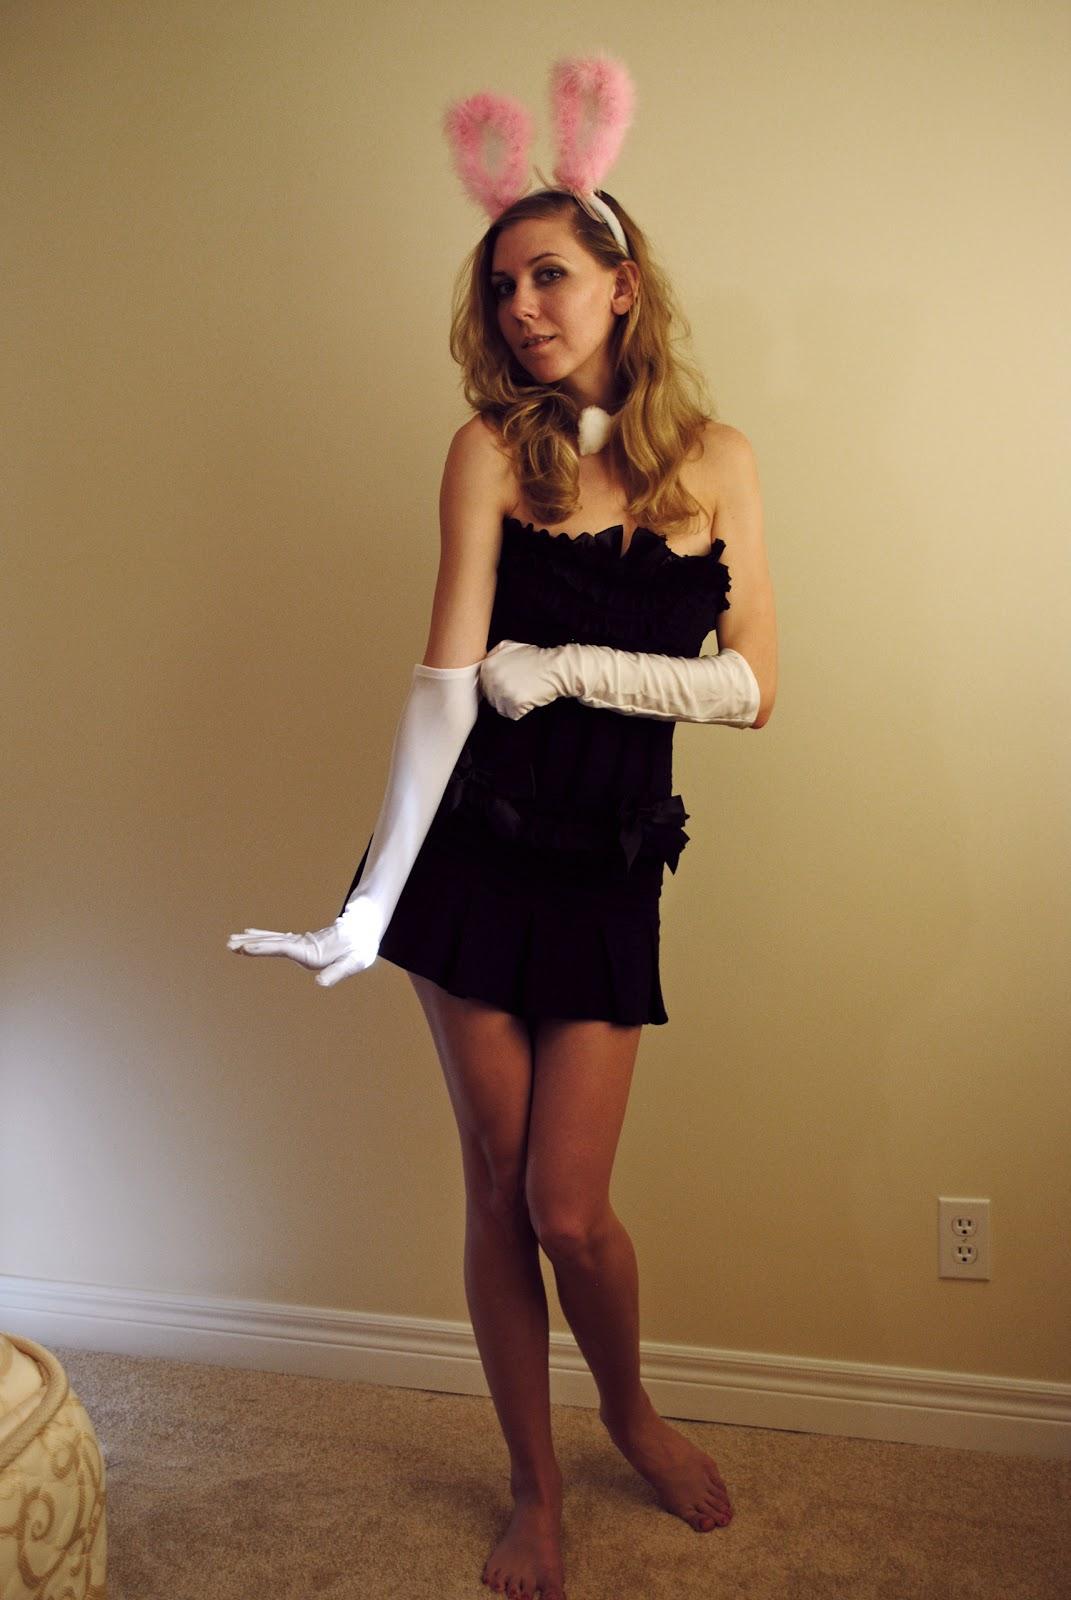 Catwalk Candy: DIY Halloween Costume Ideas